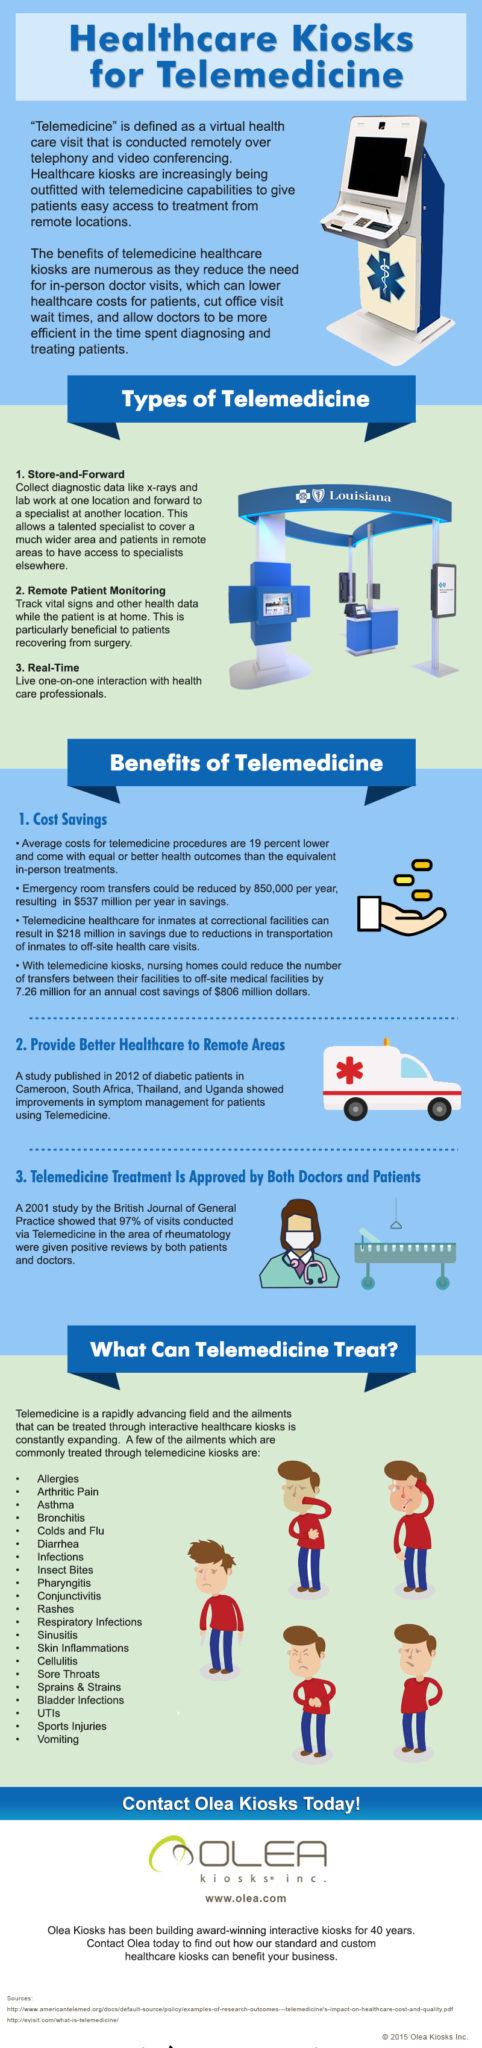 Telemedicine Healthcare Kiosks